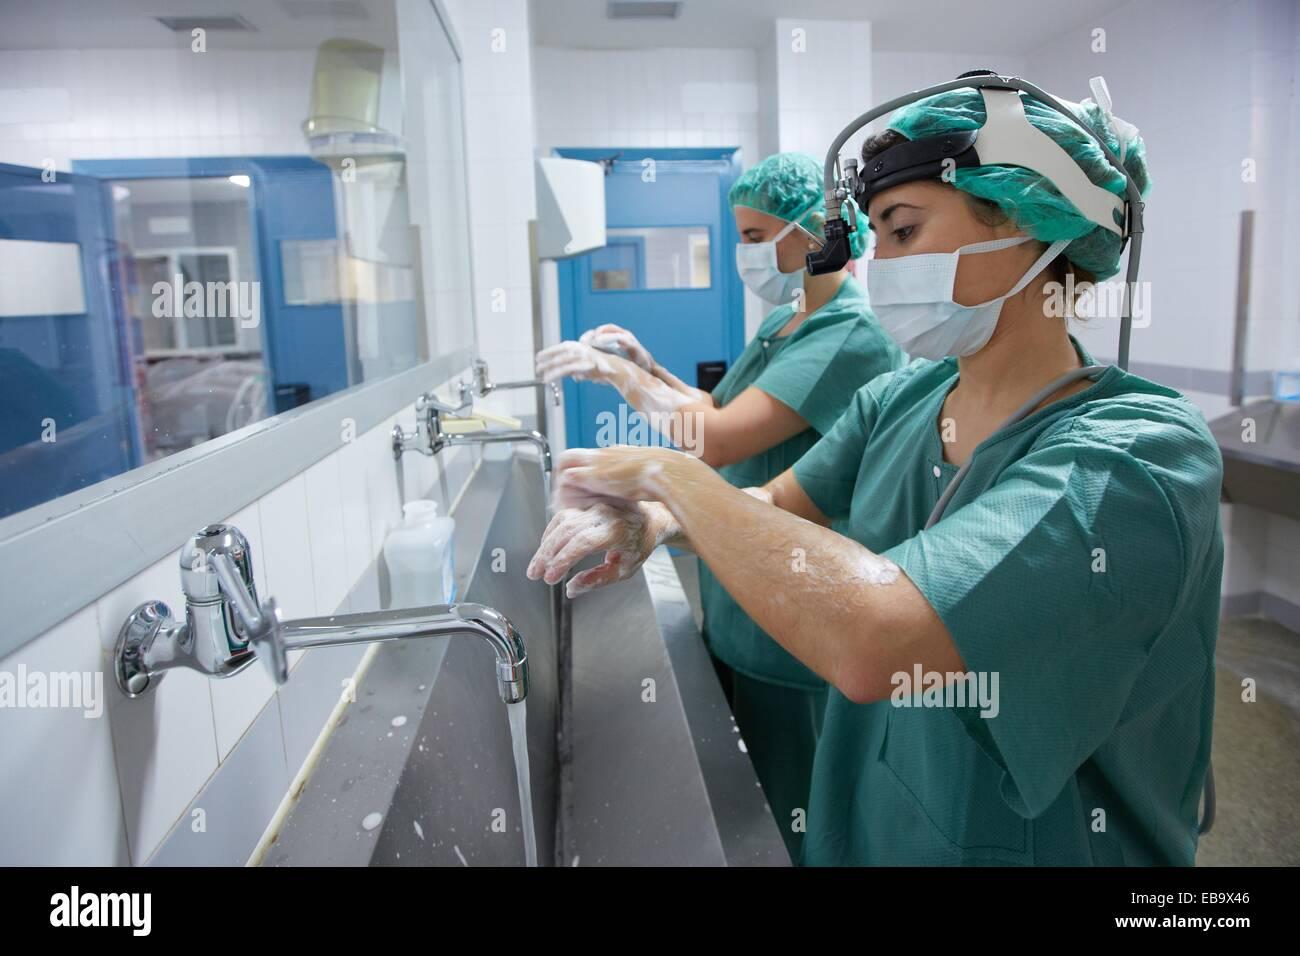 Surgical Scrub Handwashing Operating Room Surgery